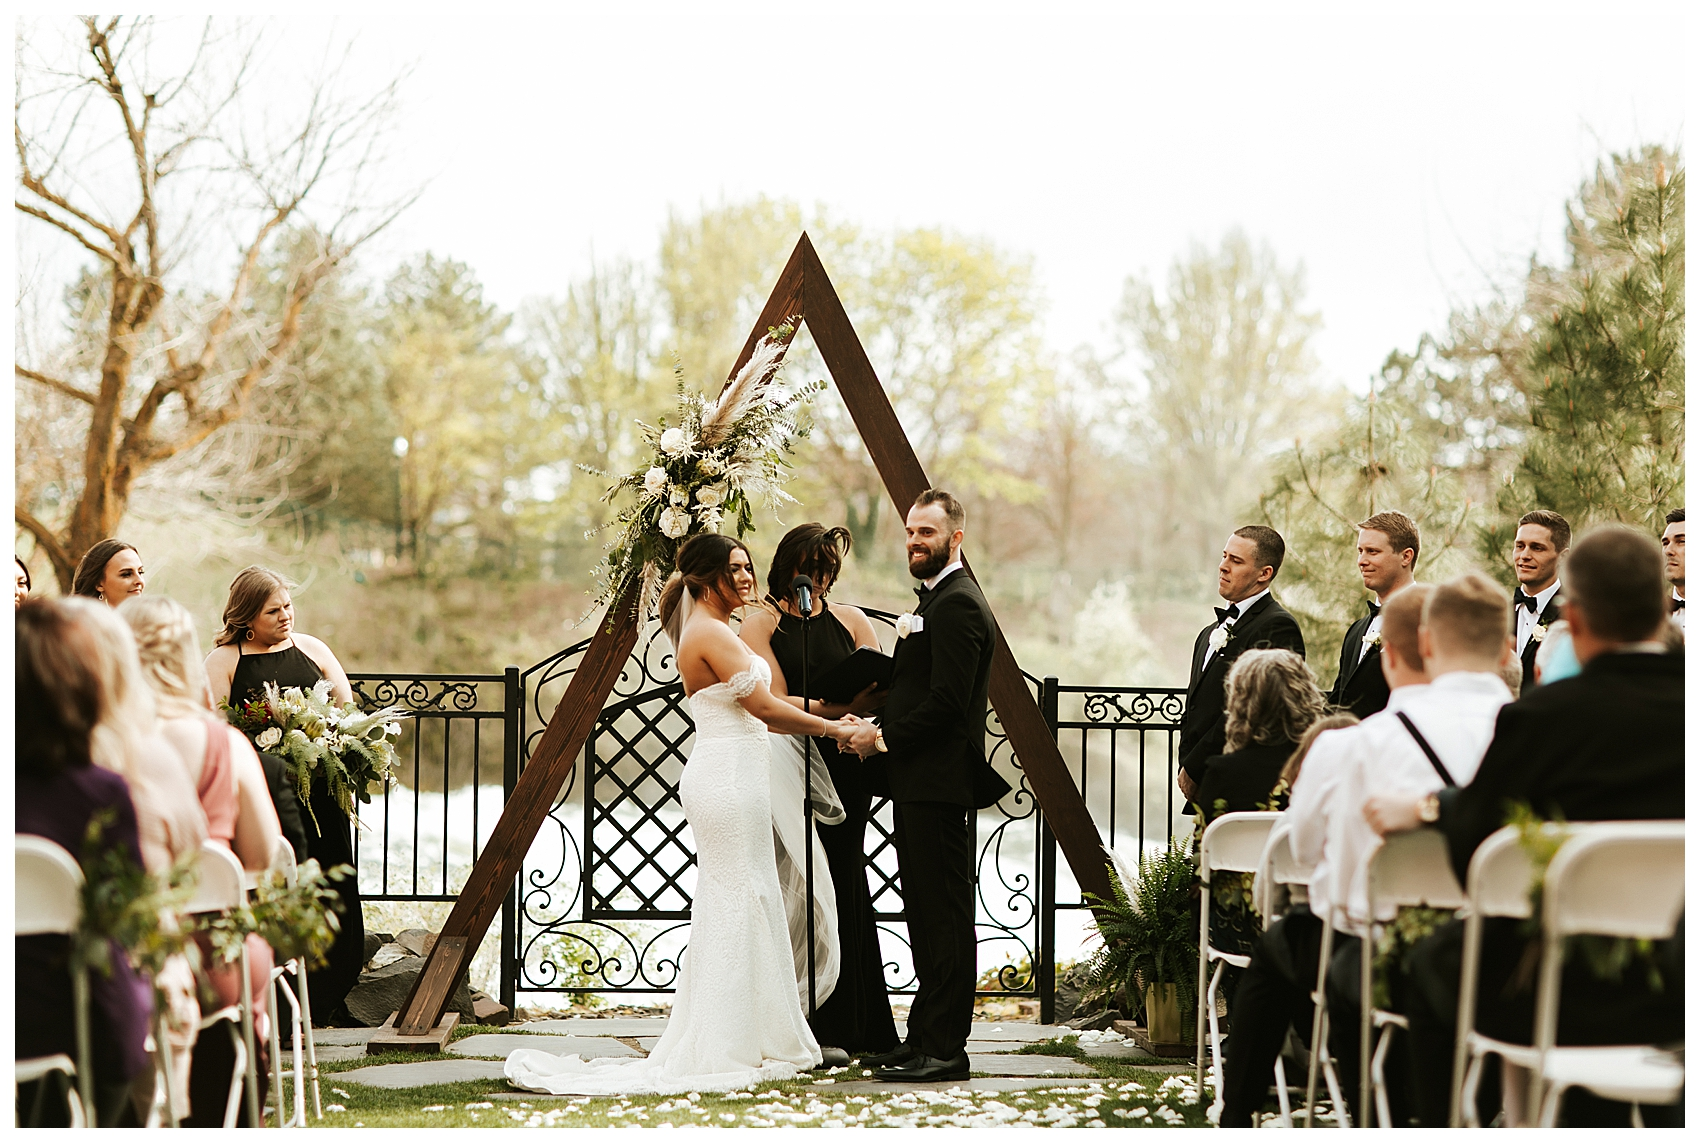 Chateau Rive Spokane Wedding Cassie Trottier Photography01056.jpg